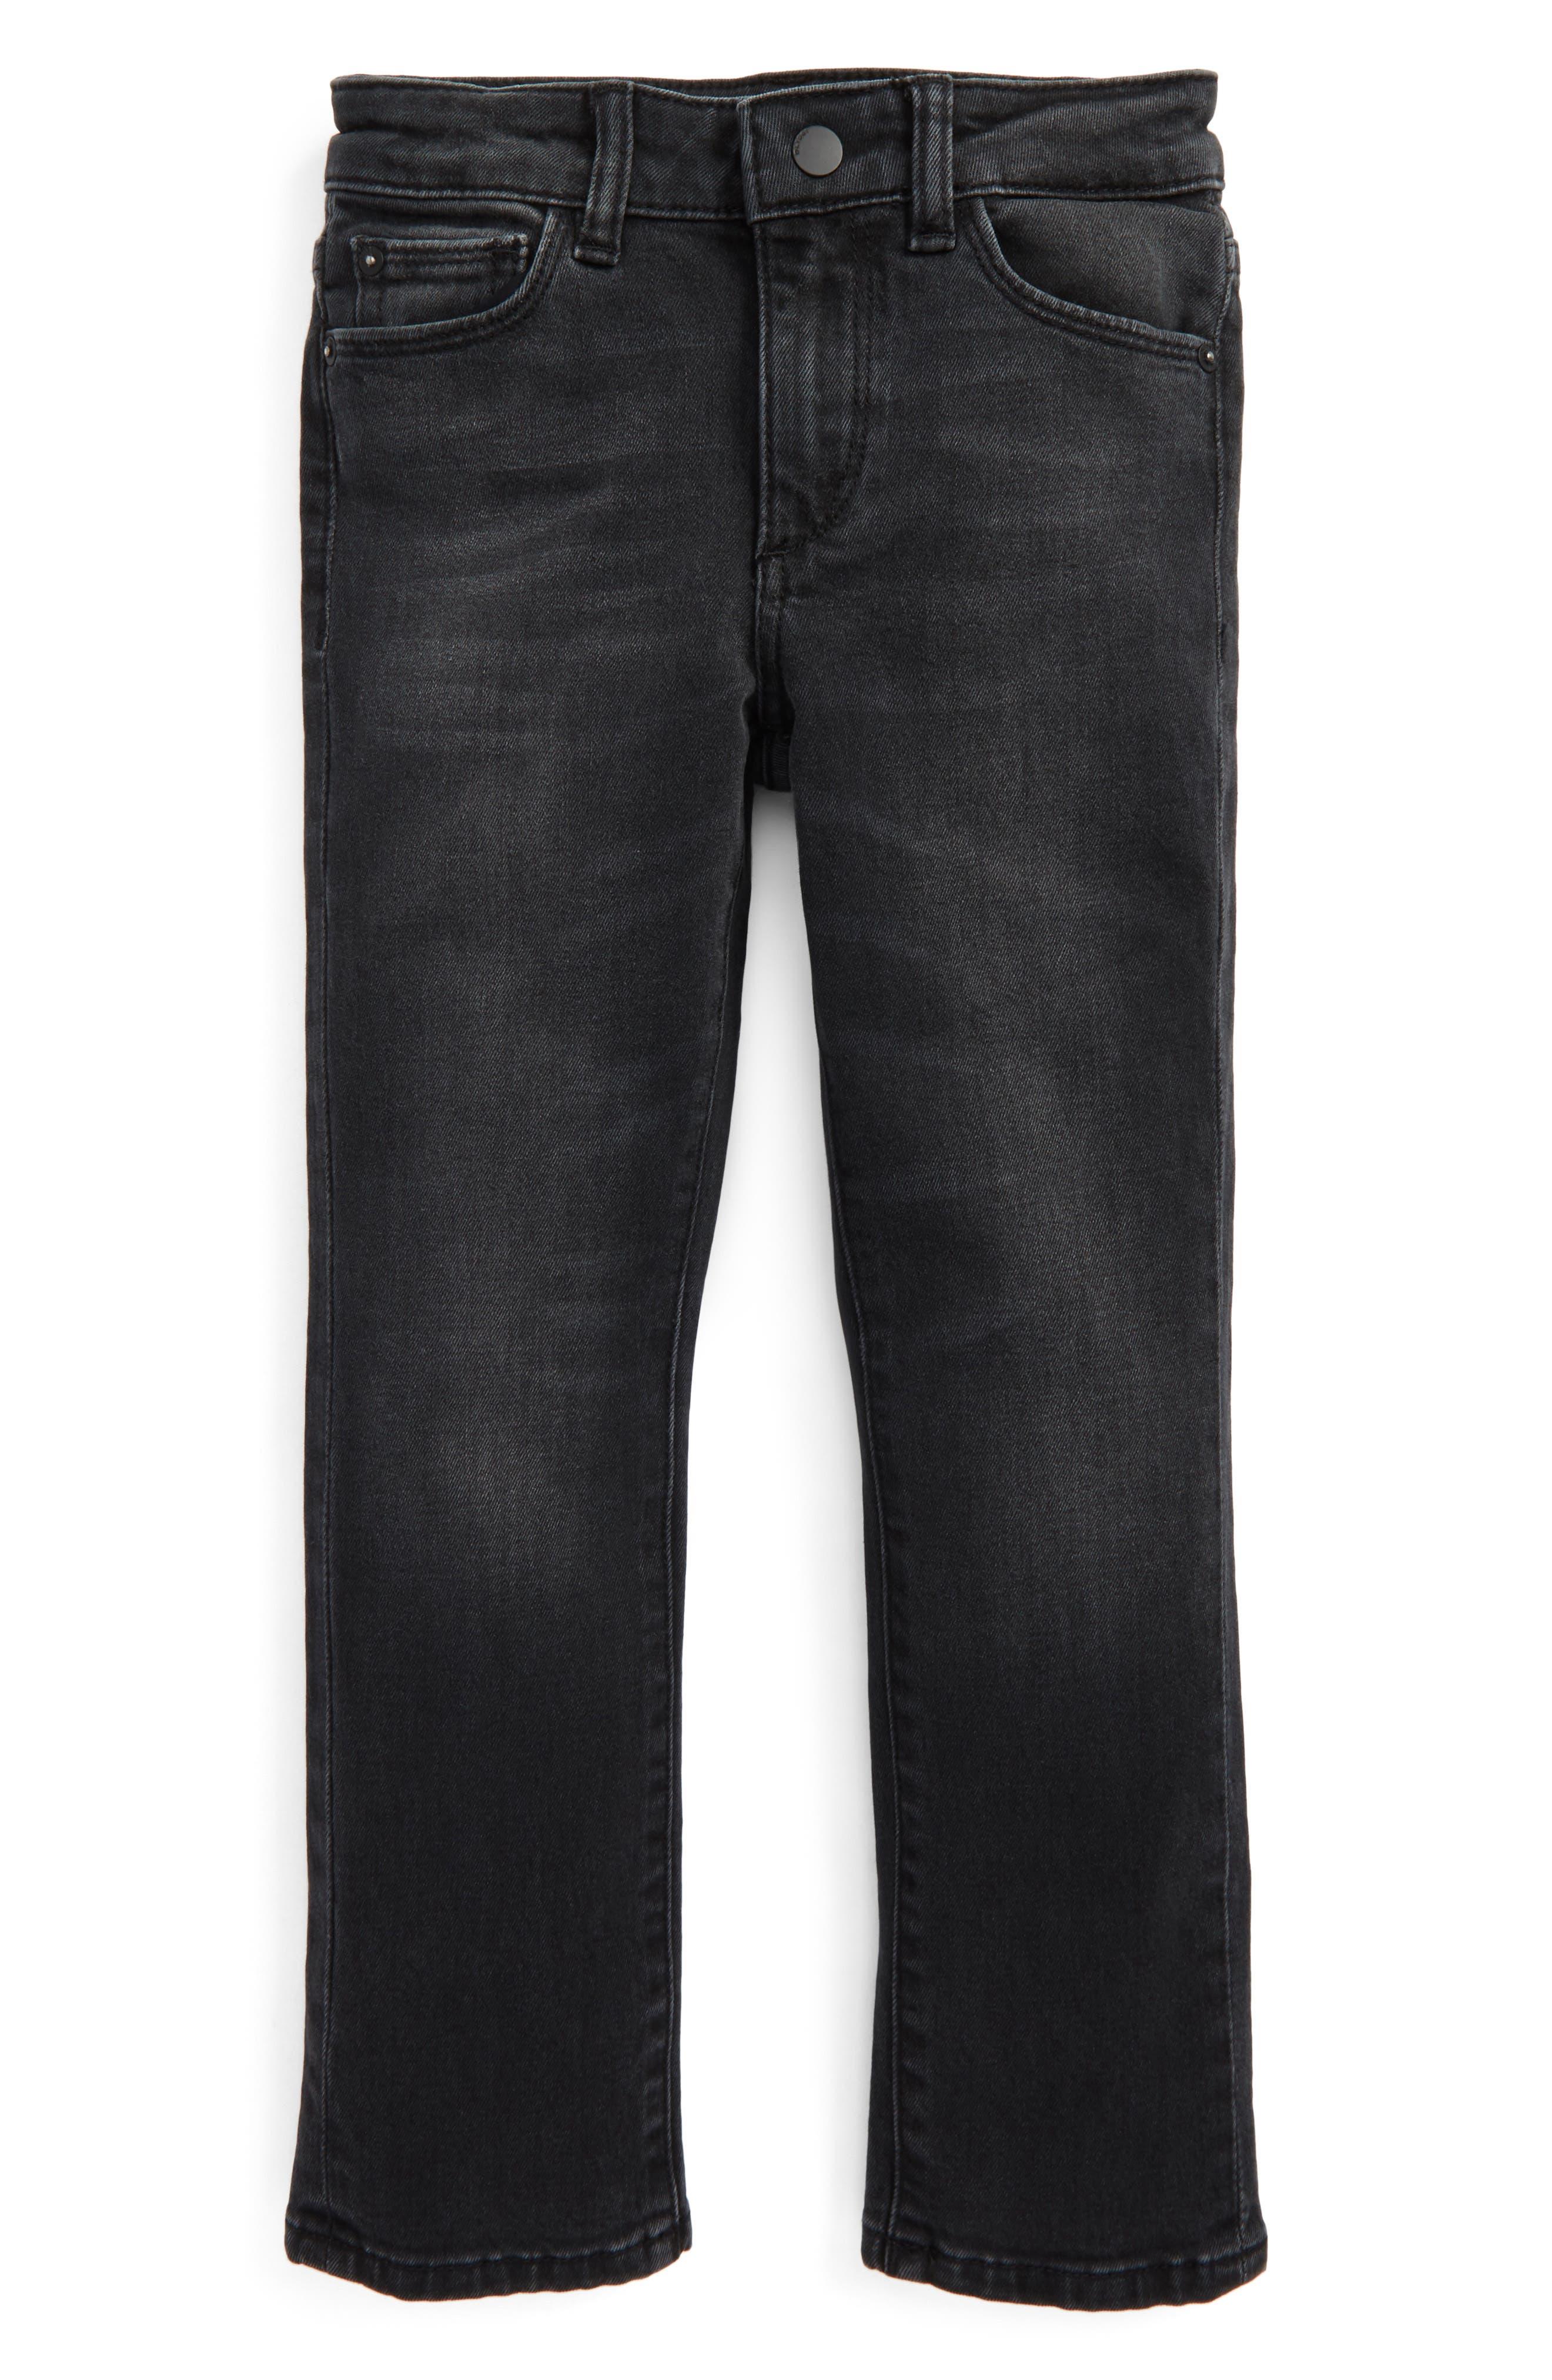 DL 1961 Hawke Skinny Jeans,                         Main,                         color, 400